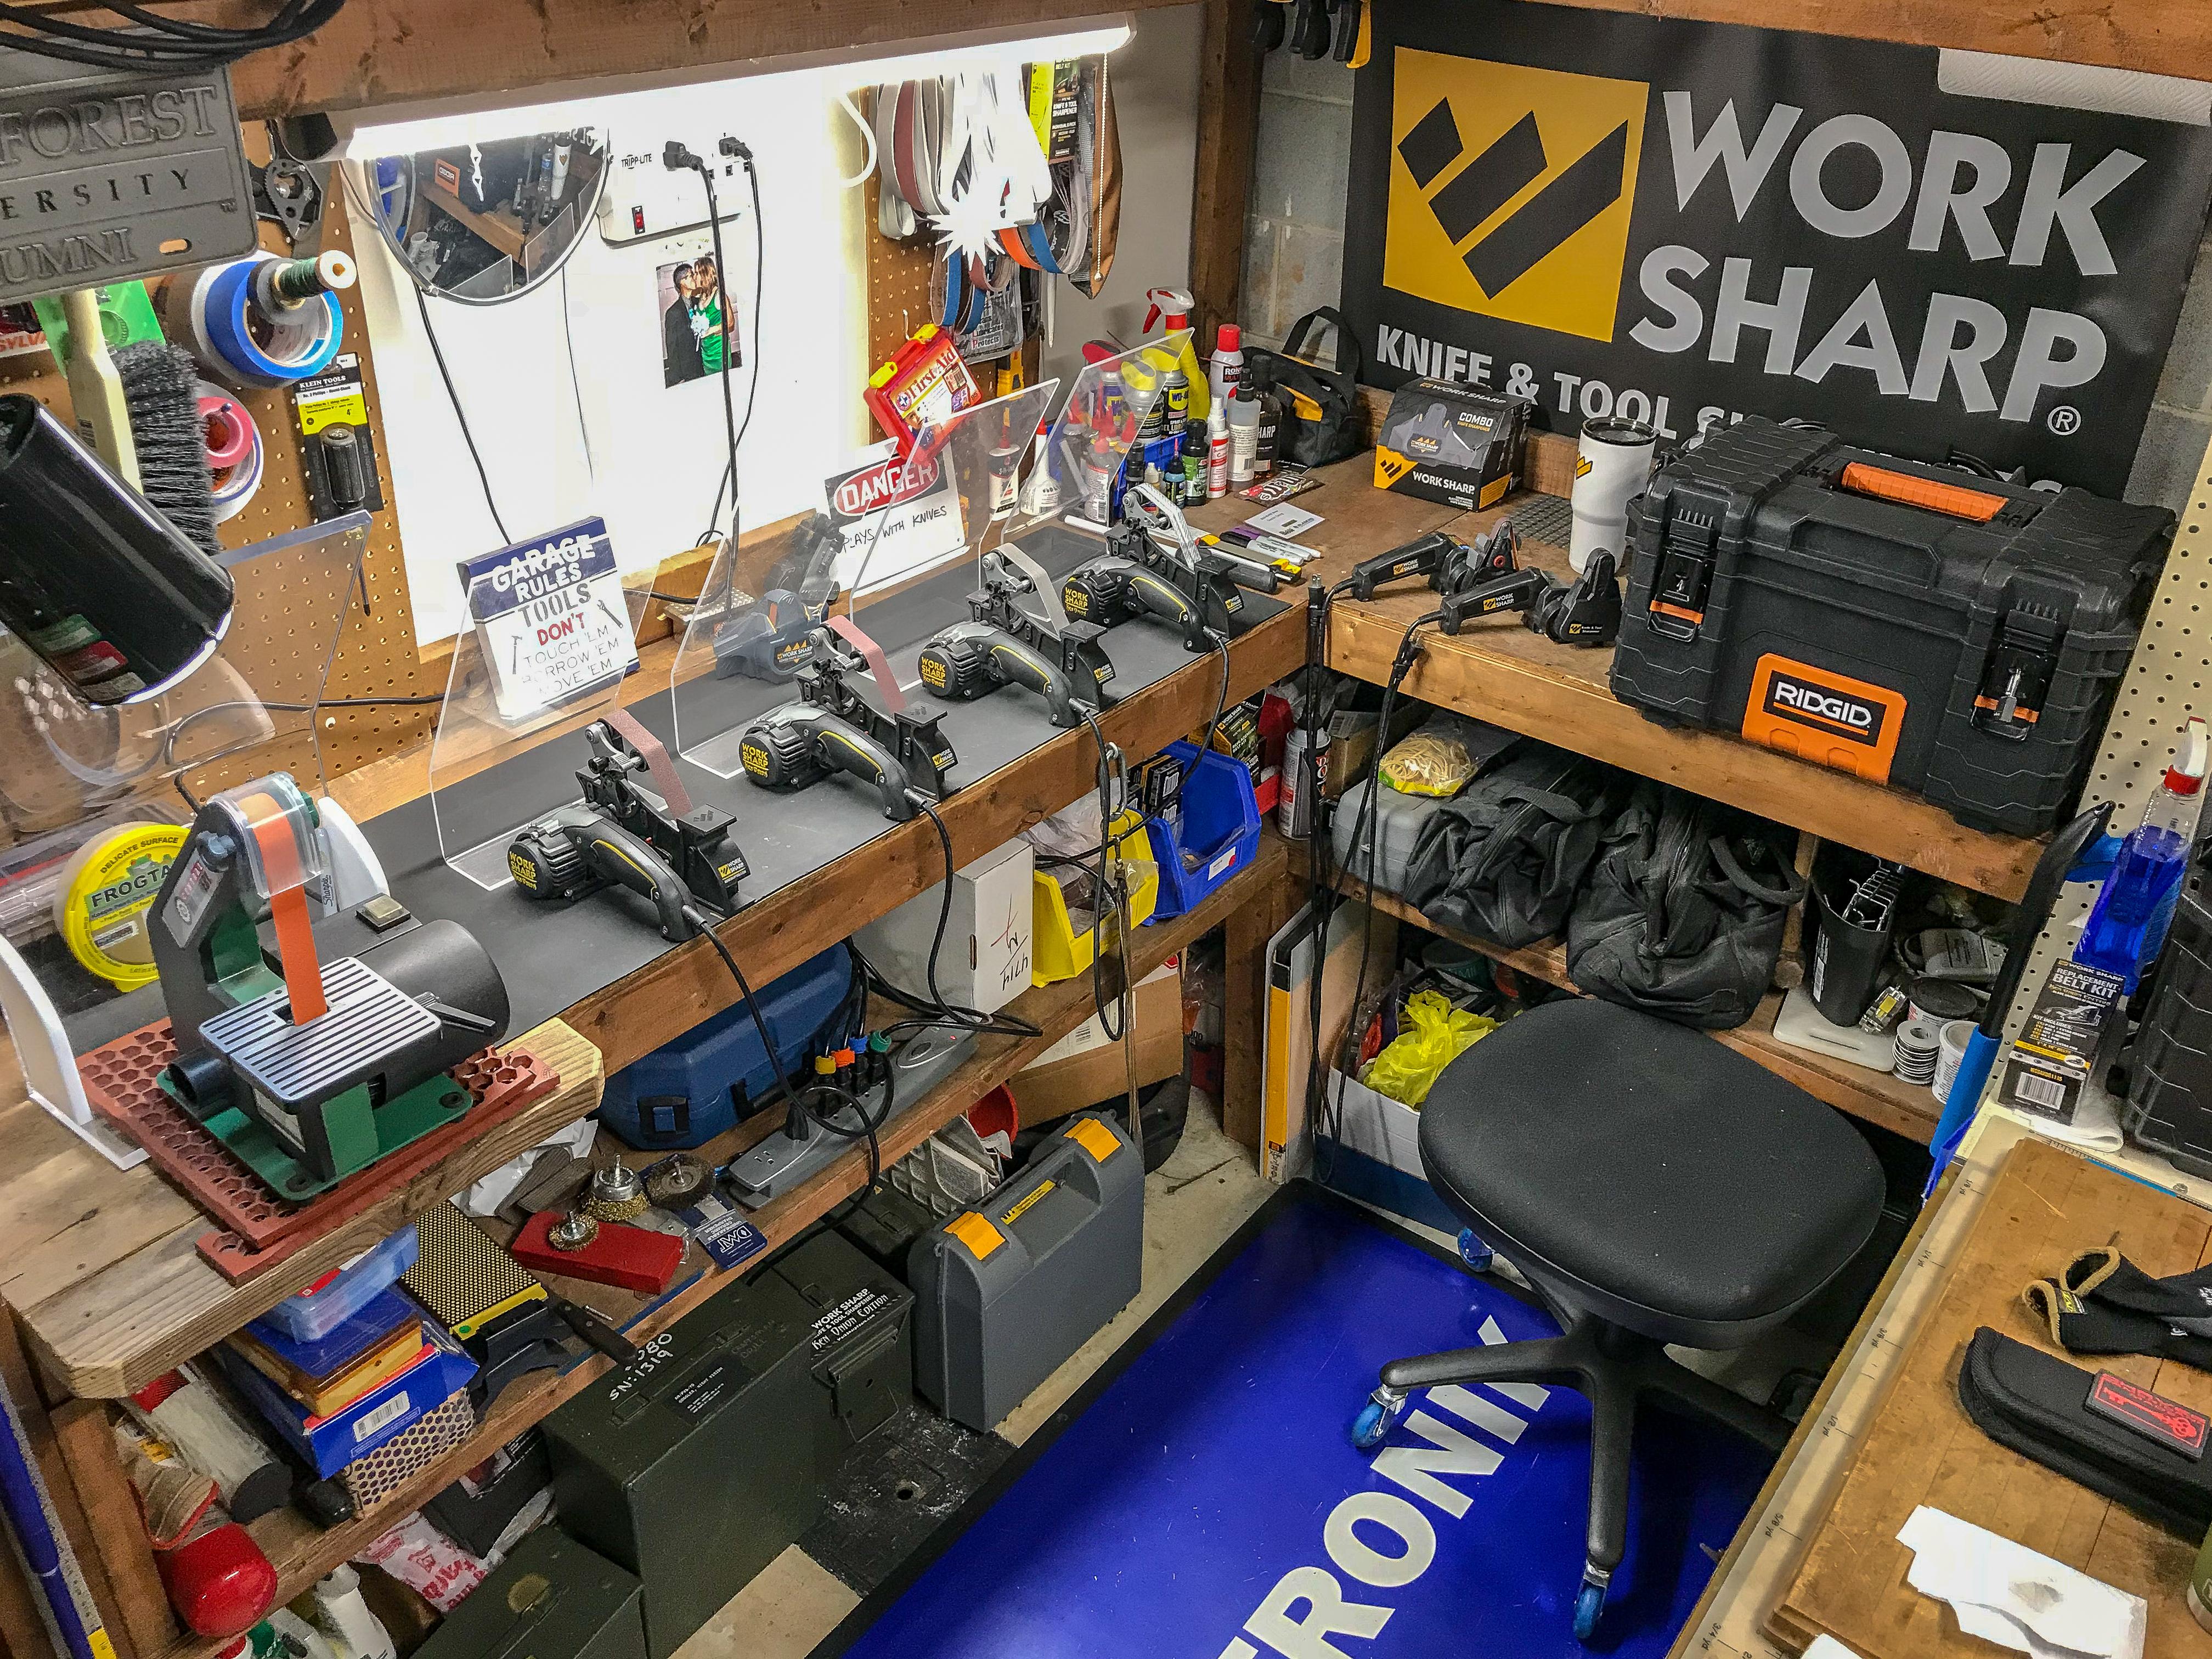 Work Sharp Knife and Tool Sharpener How to Sharpen